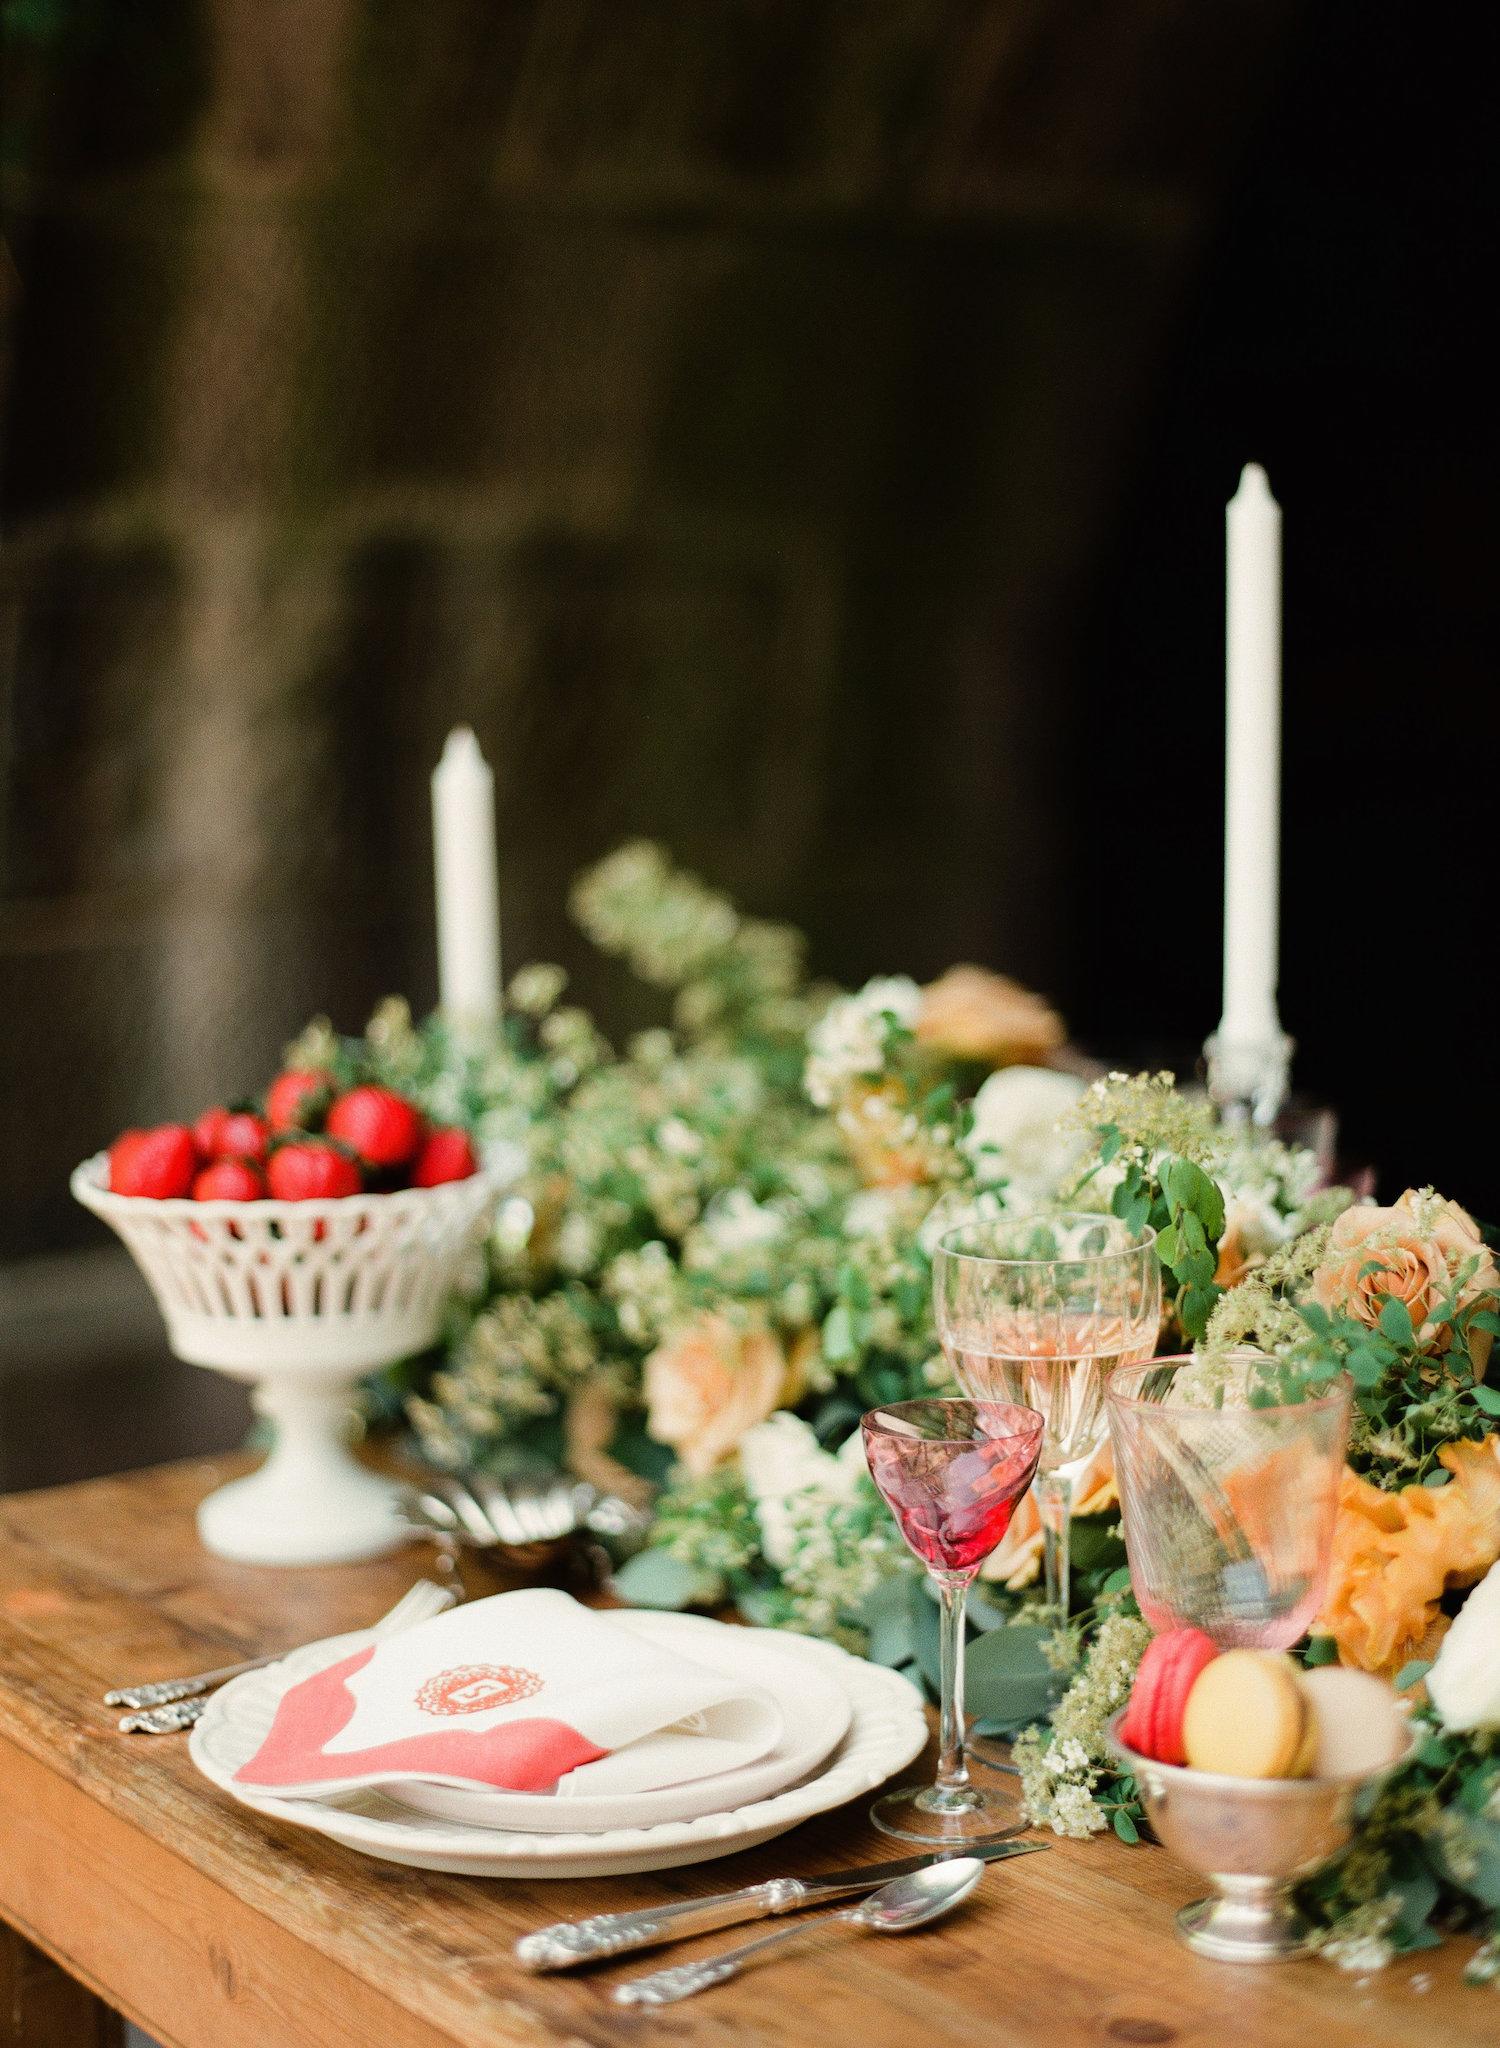 Morning Glow - Full Aperture Floral & Lindsay Madden Photography 83.jpeg